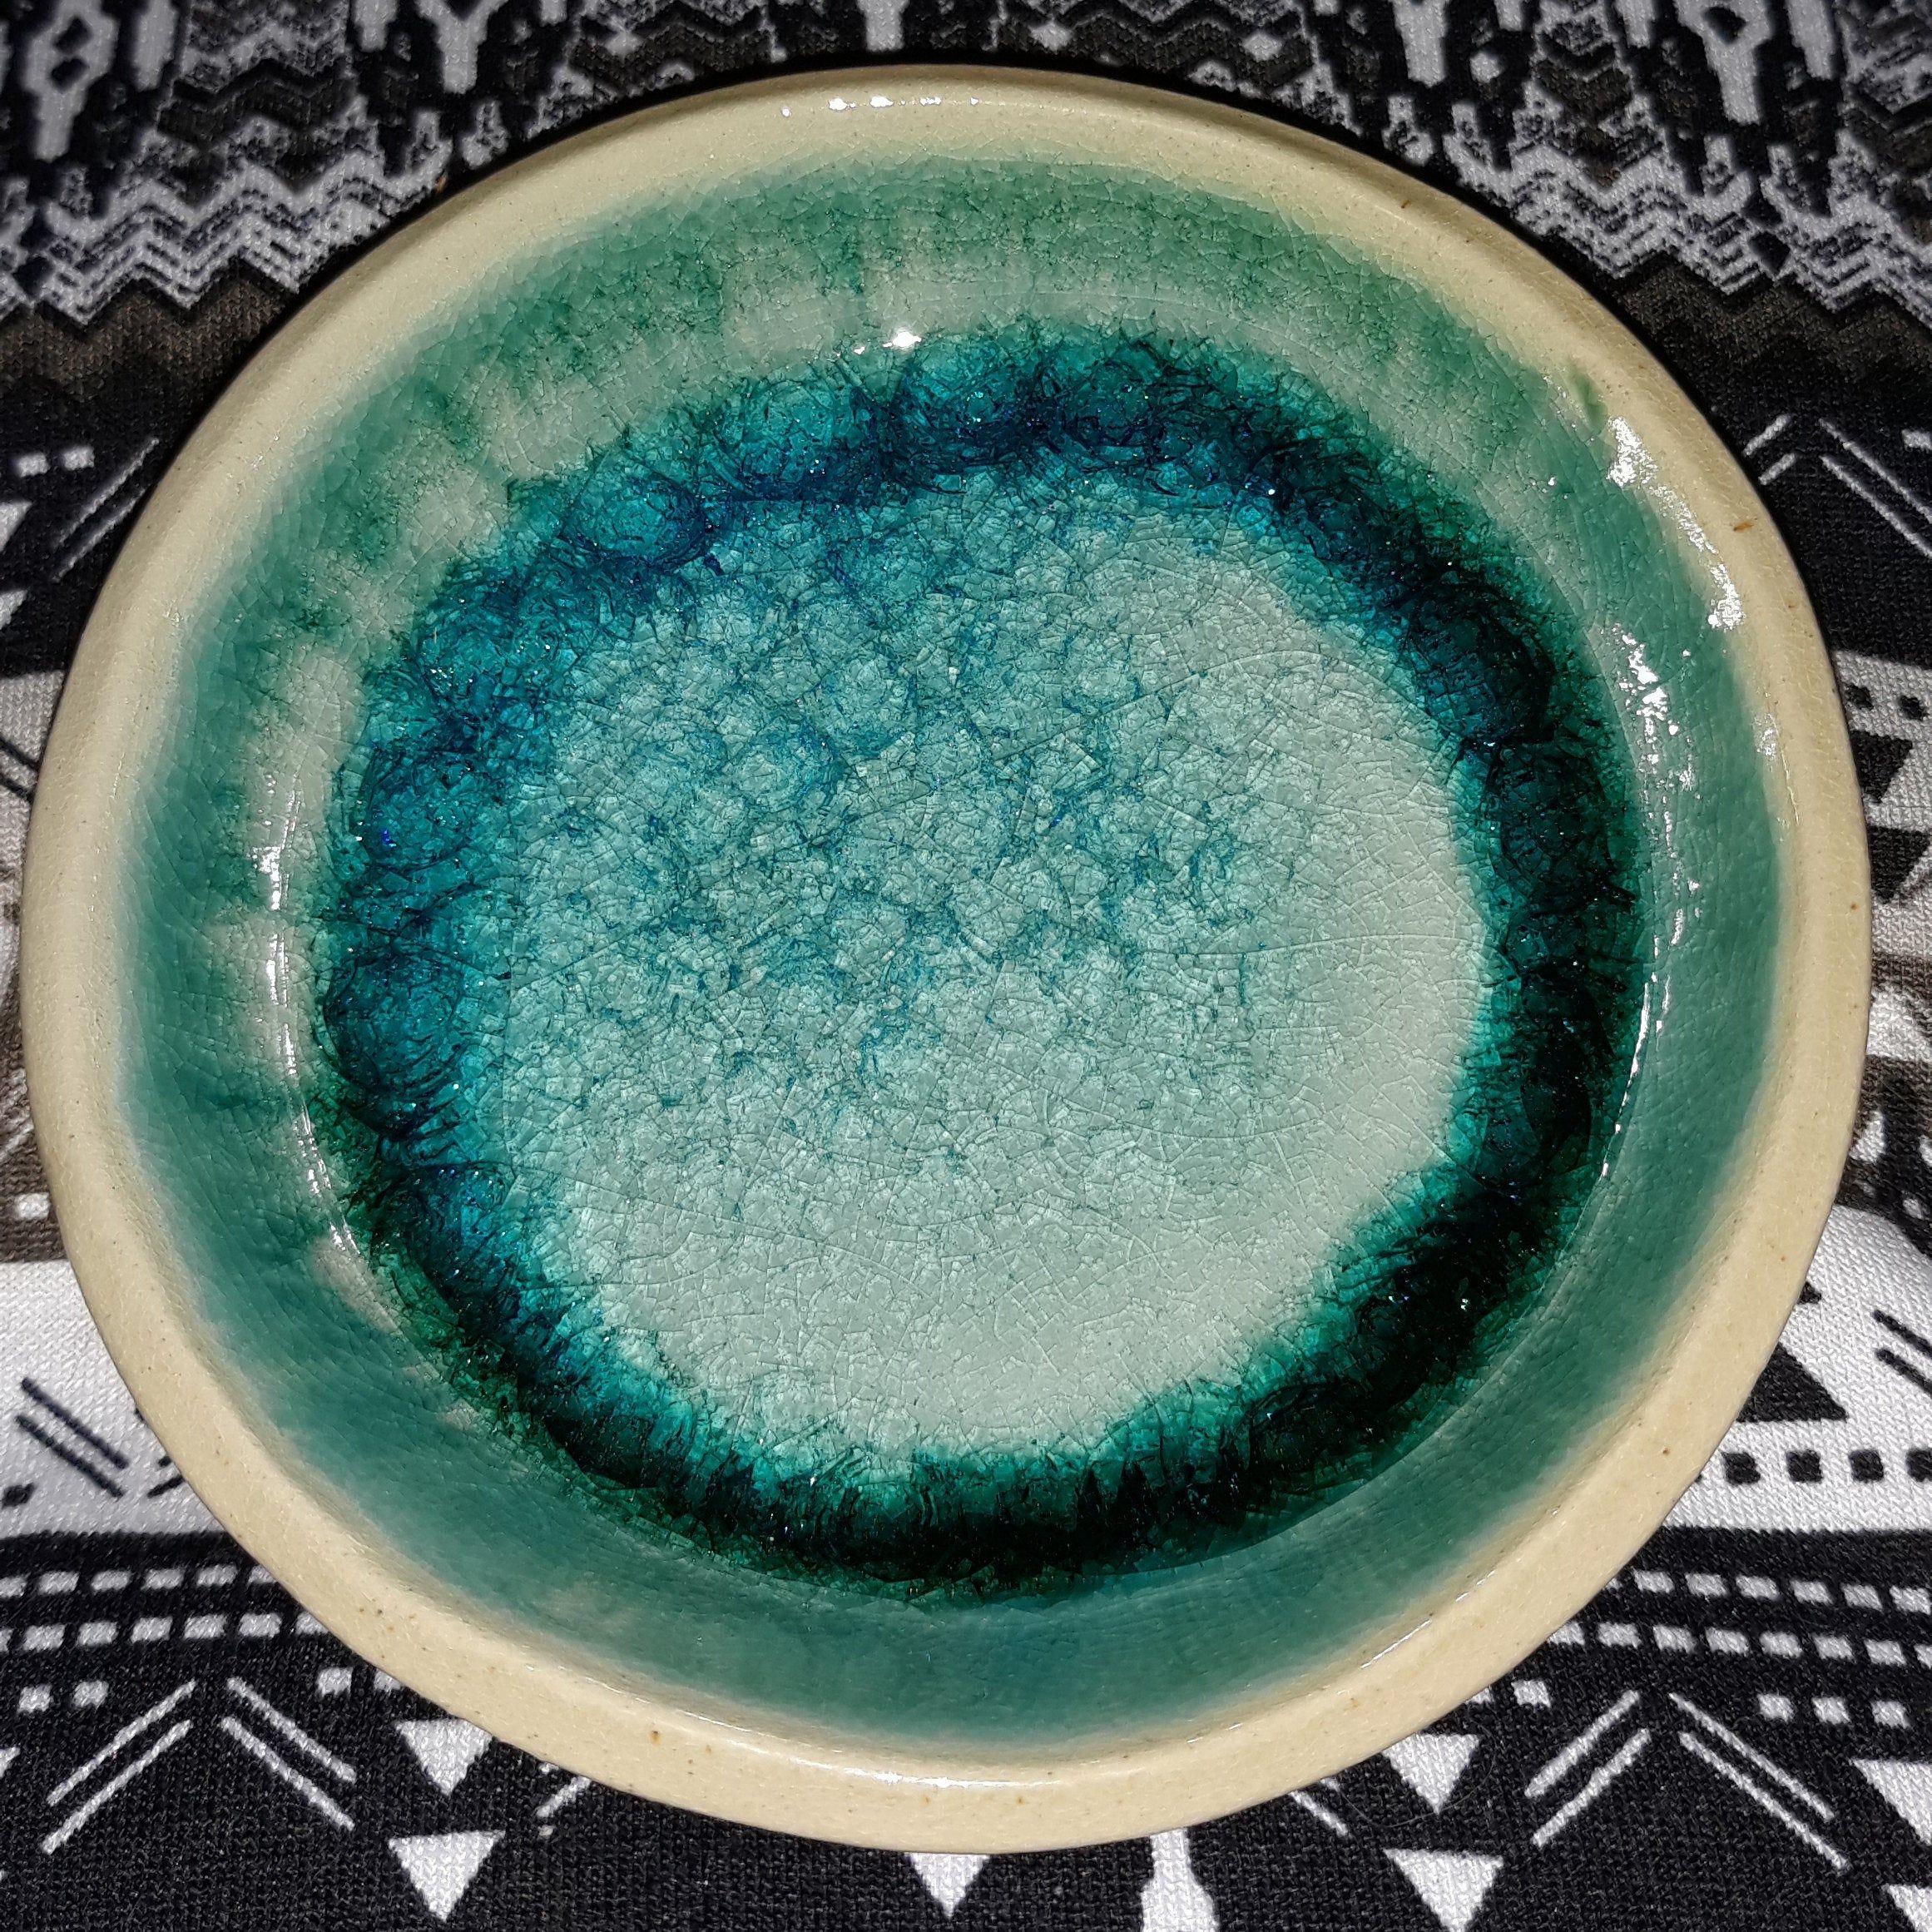 Farmhouse Dinnerware Set Rustic Handmade Ceramic Set Of Etsy Ceramic Dinnerware Set Handmade Pottery Plates Dinnerware Sets Rustic